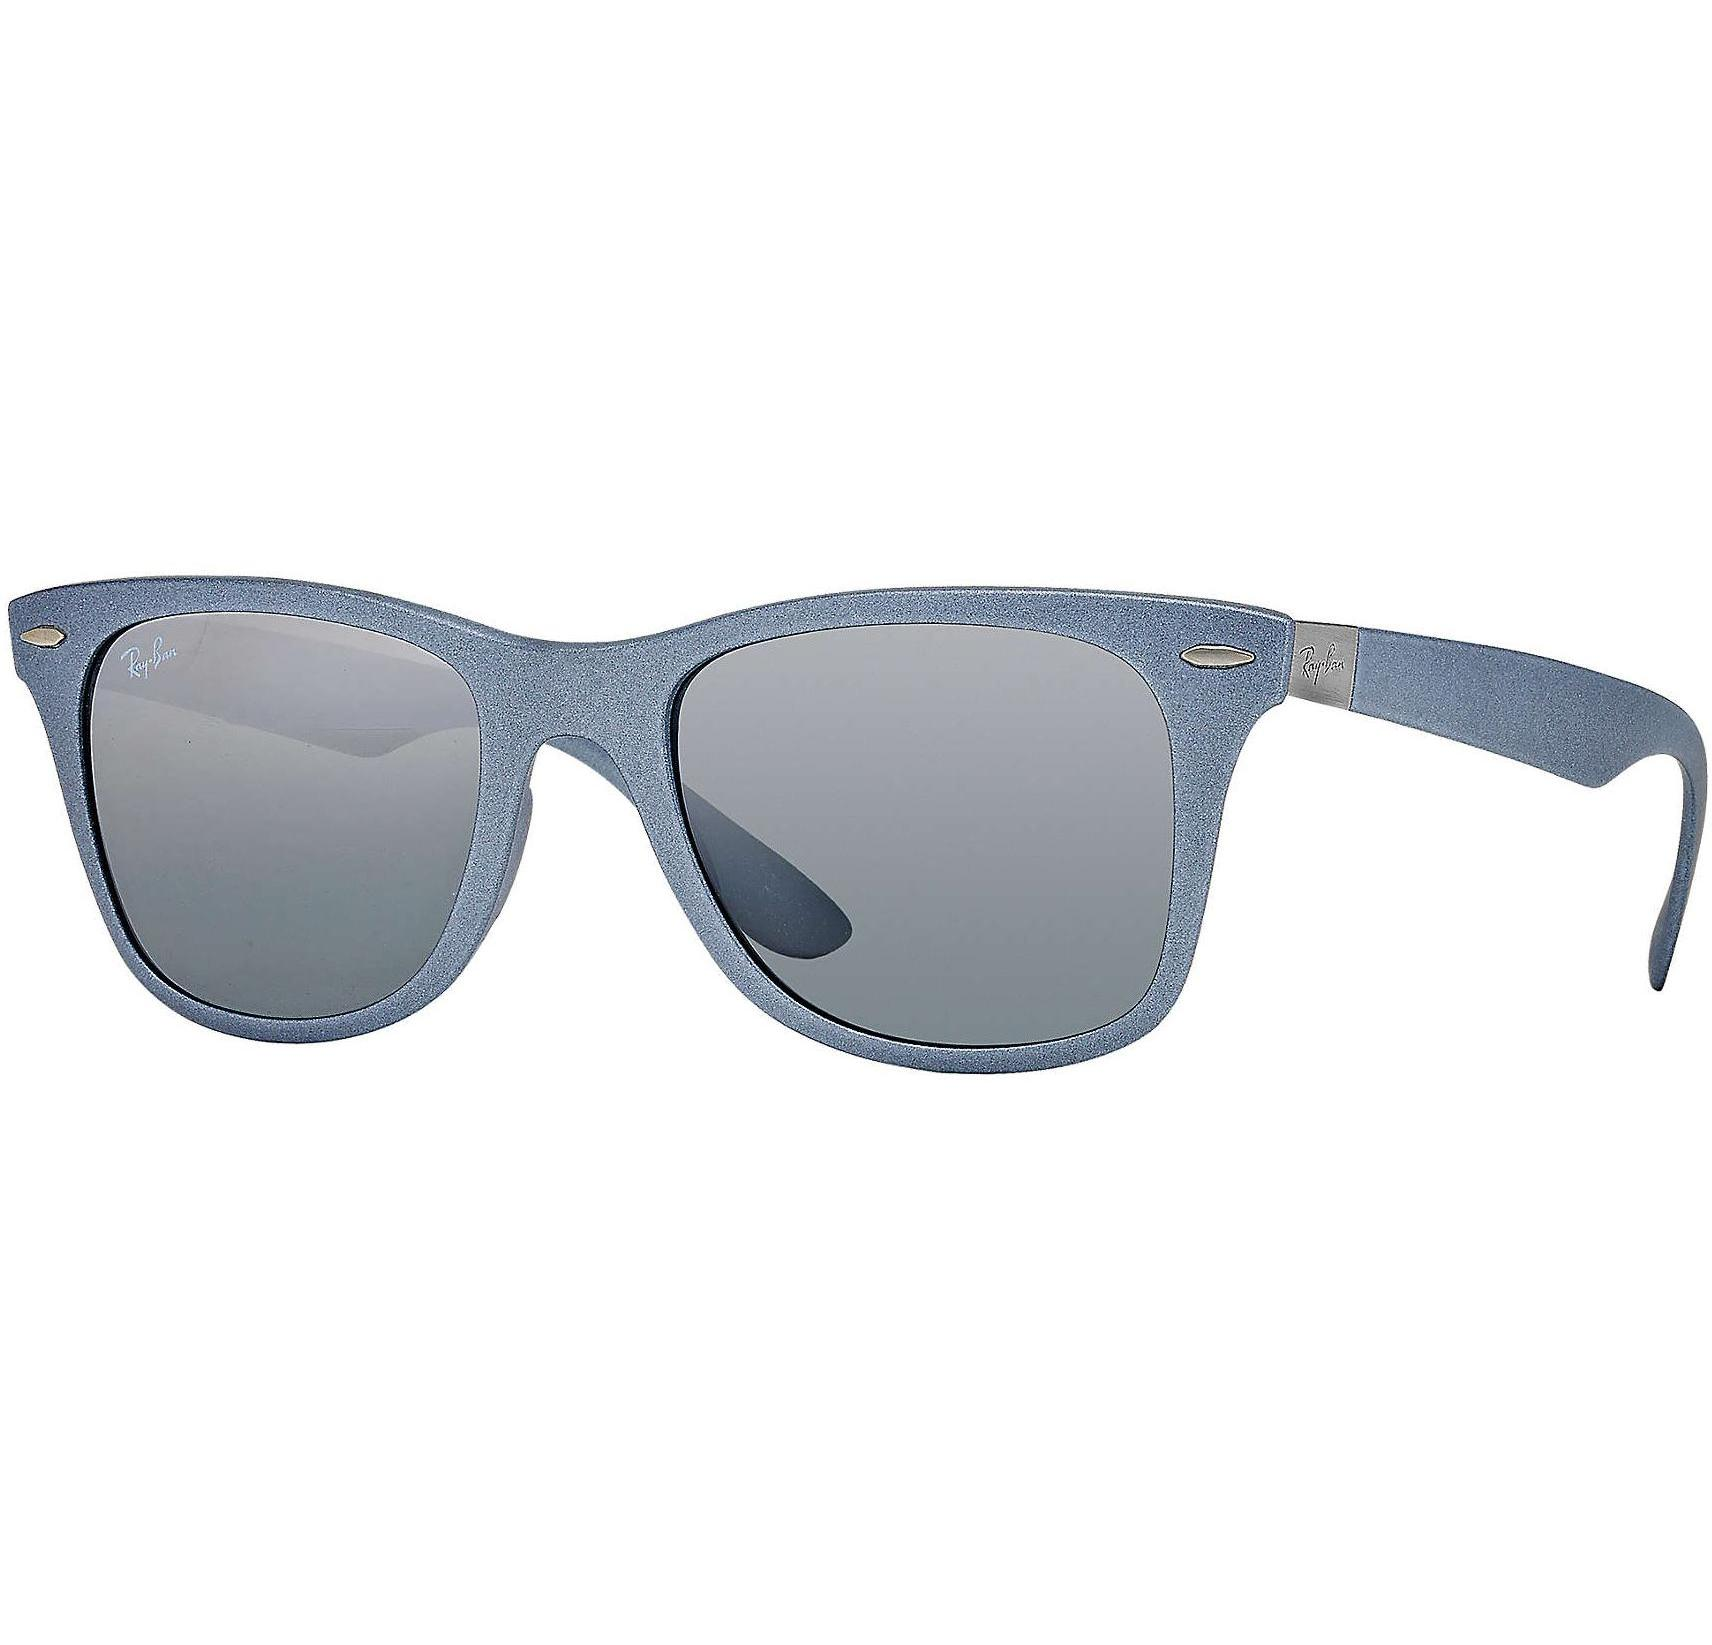 03ba4321b Buy Ray-ban Wayfarer Liteforce Silver Grey/grey Gradient Mirror Lens ...